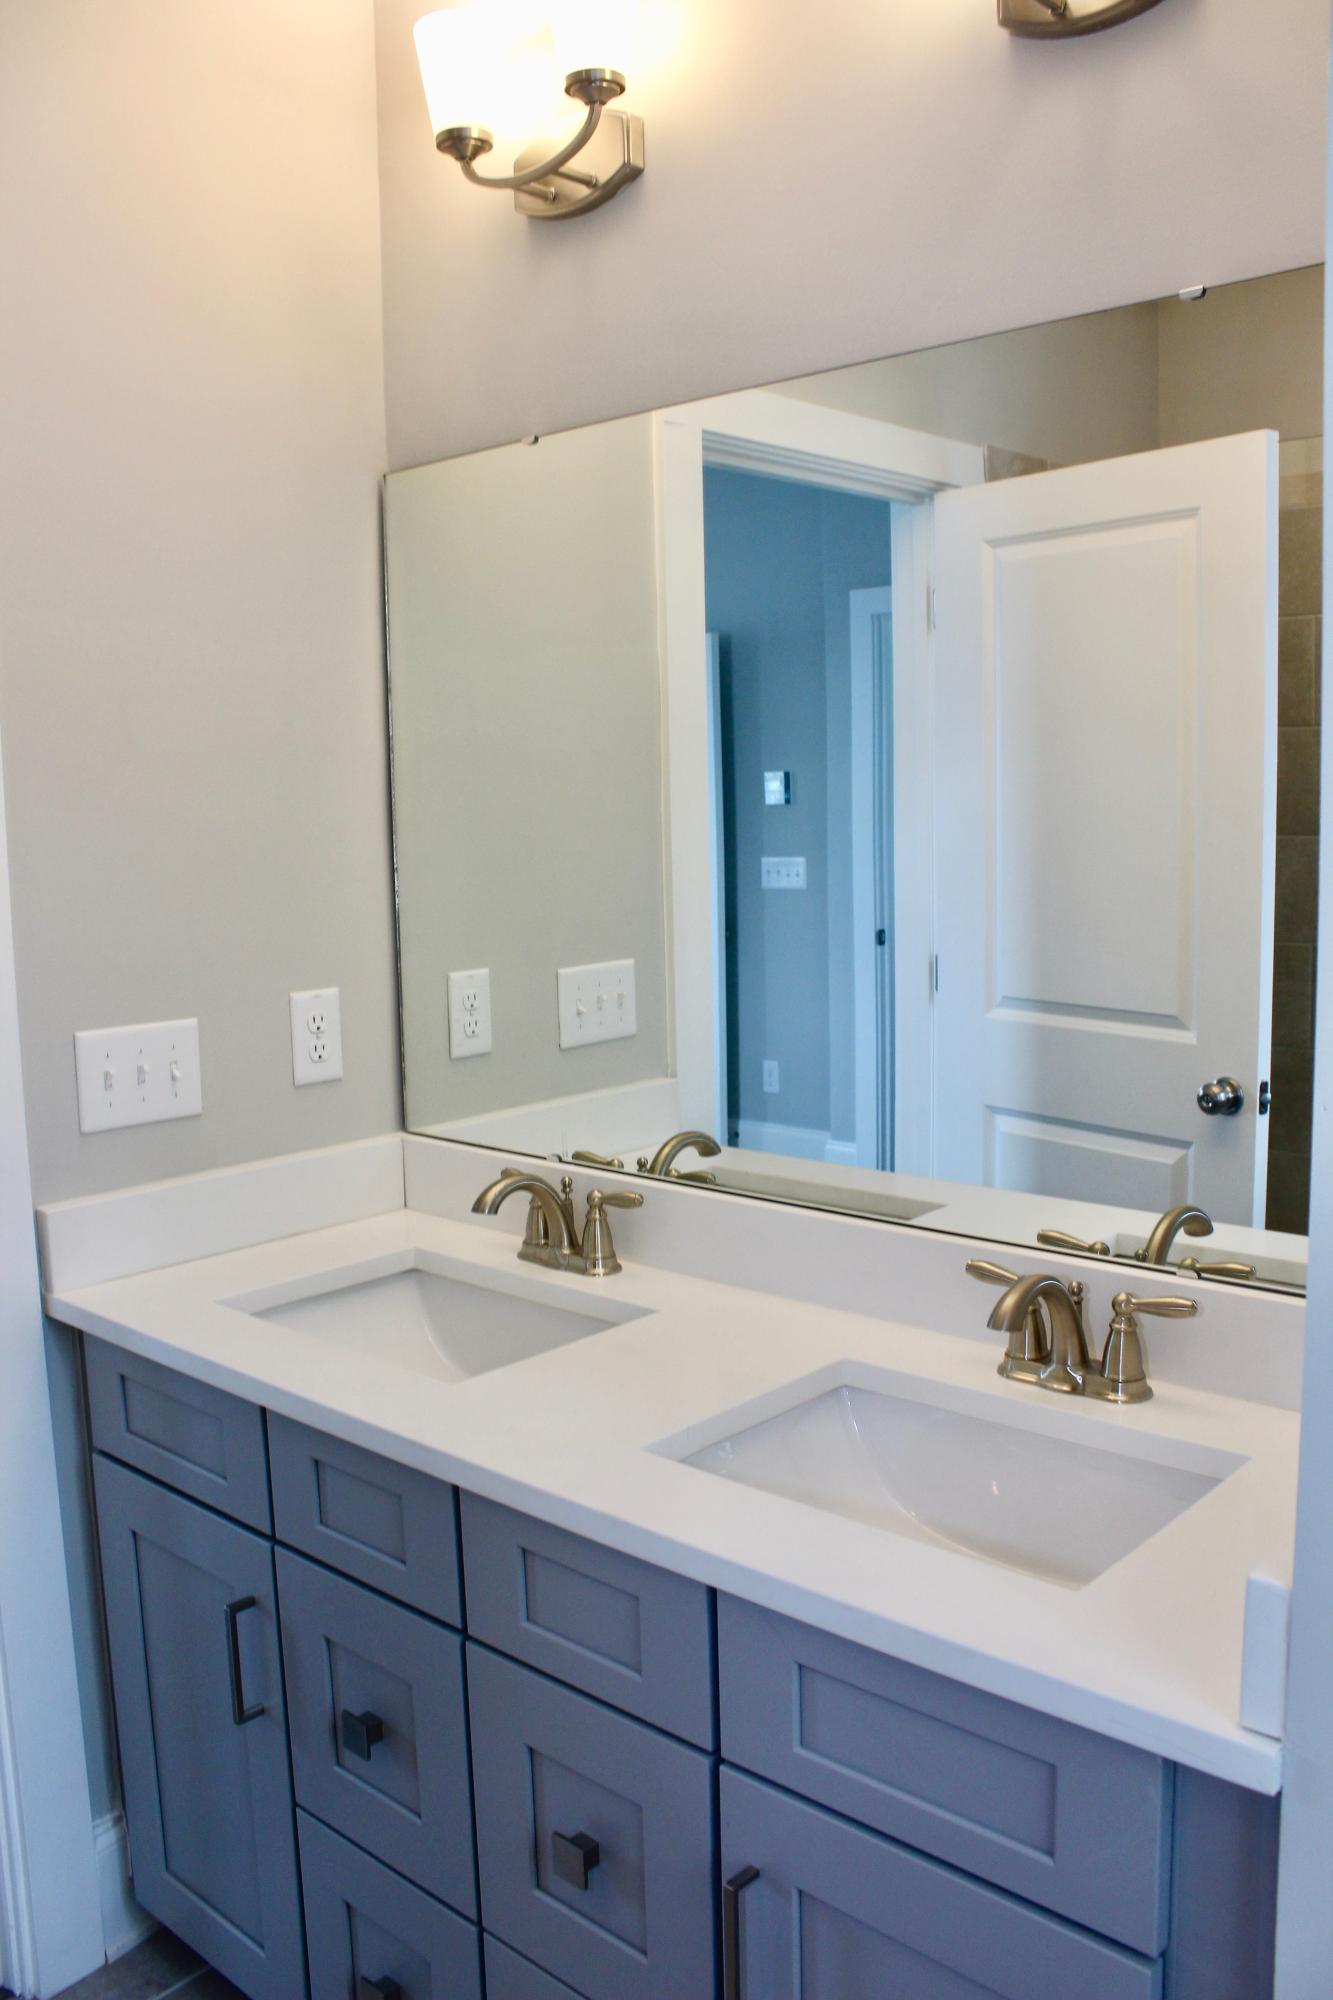 Morris Square Homes For Sale - 41 Dereef, Charleston, SC - 6